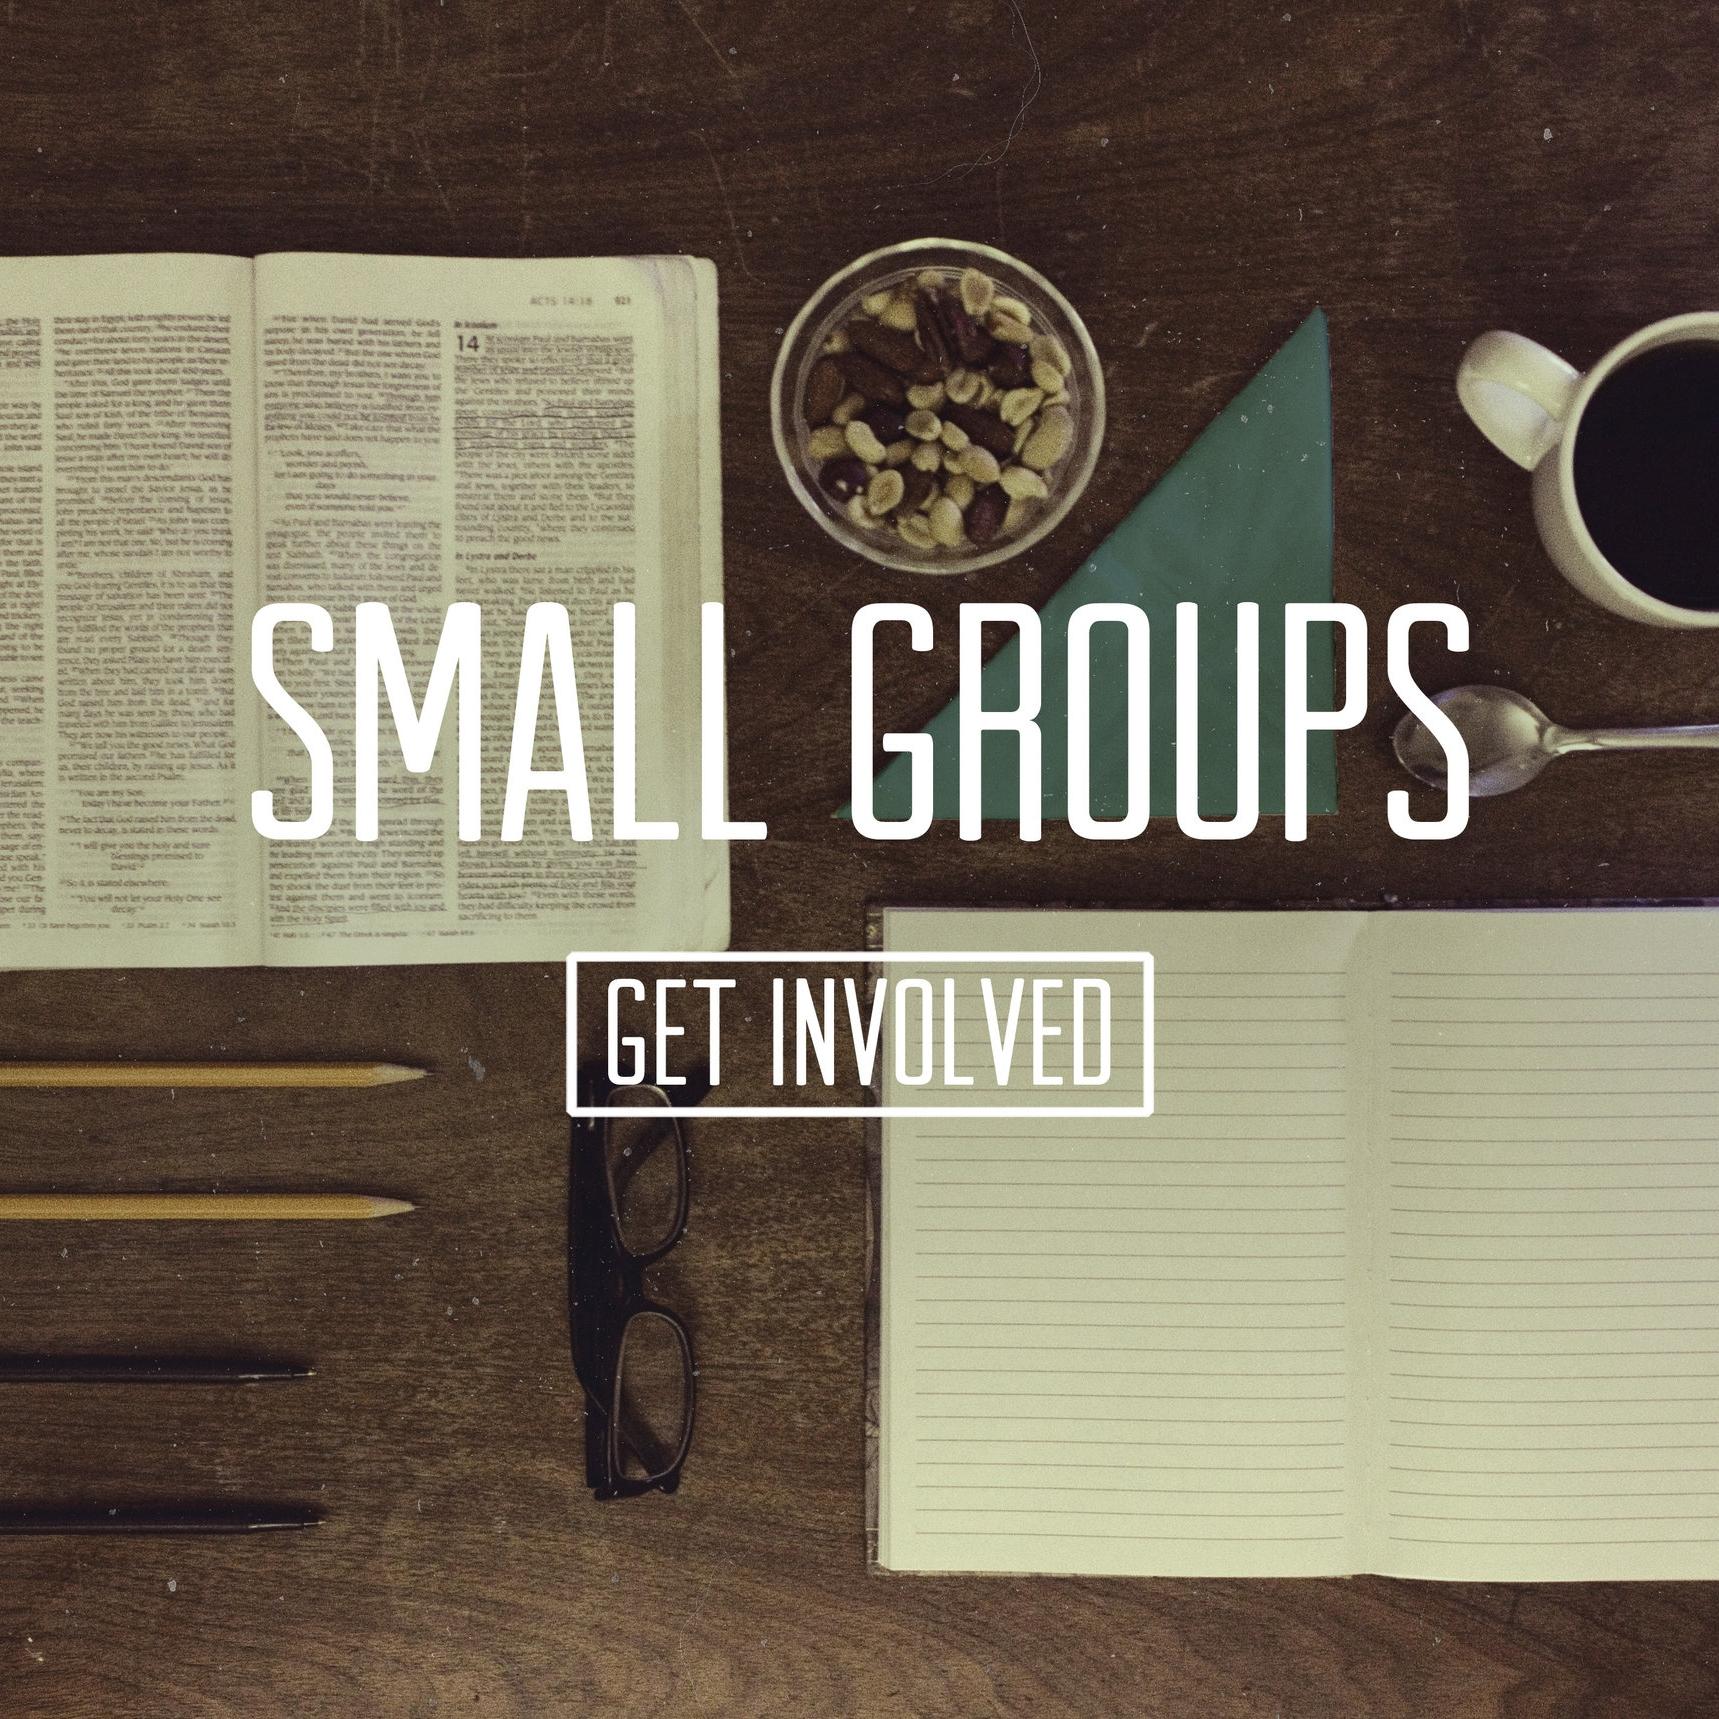 Small_Groups_Image.jpg